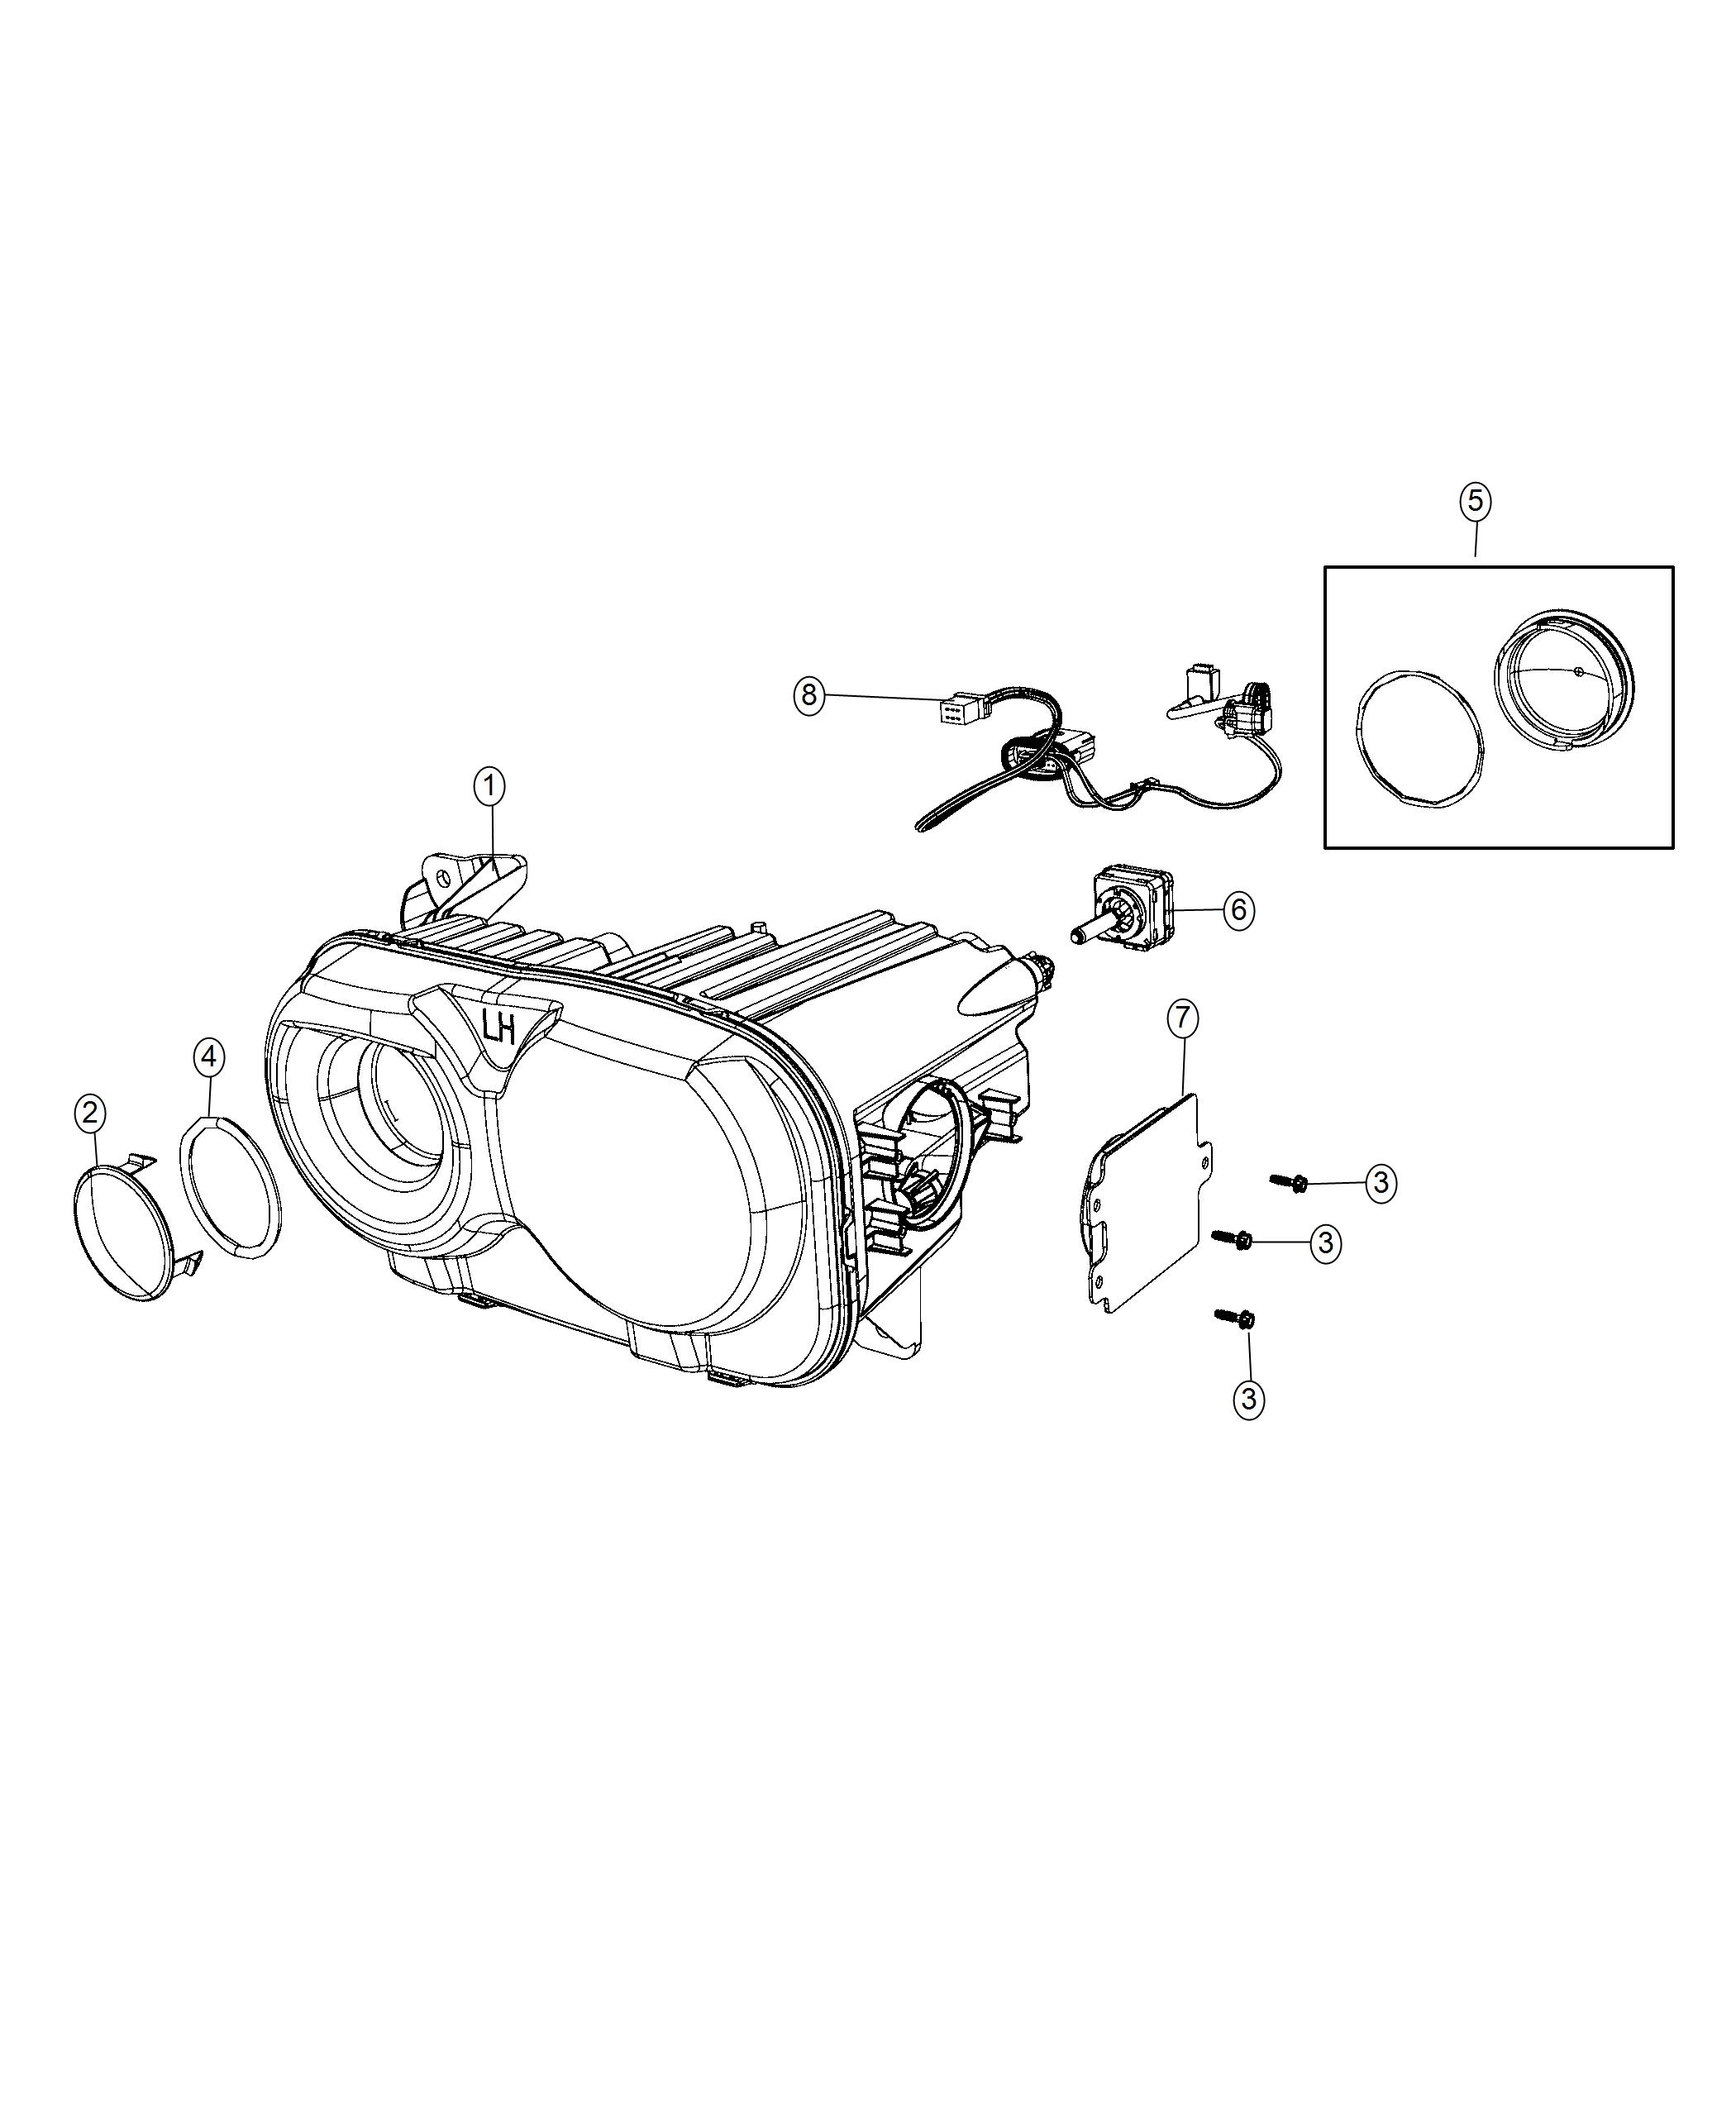 Dodge Challenger Headlamp Left High Intensity Discharge Headlamps Illuminated